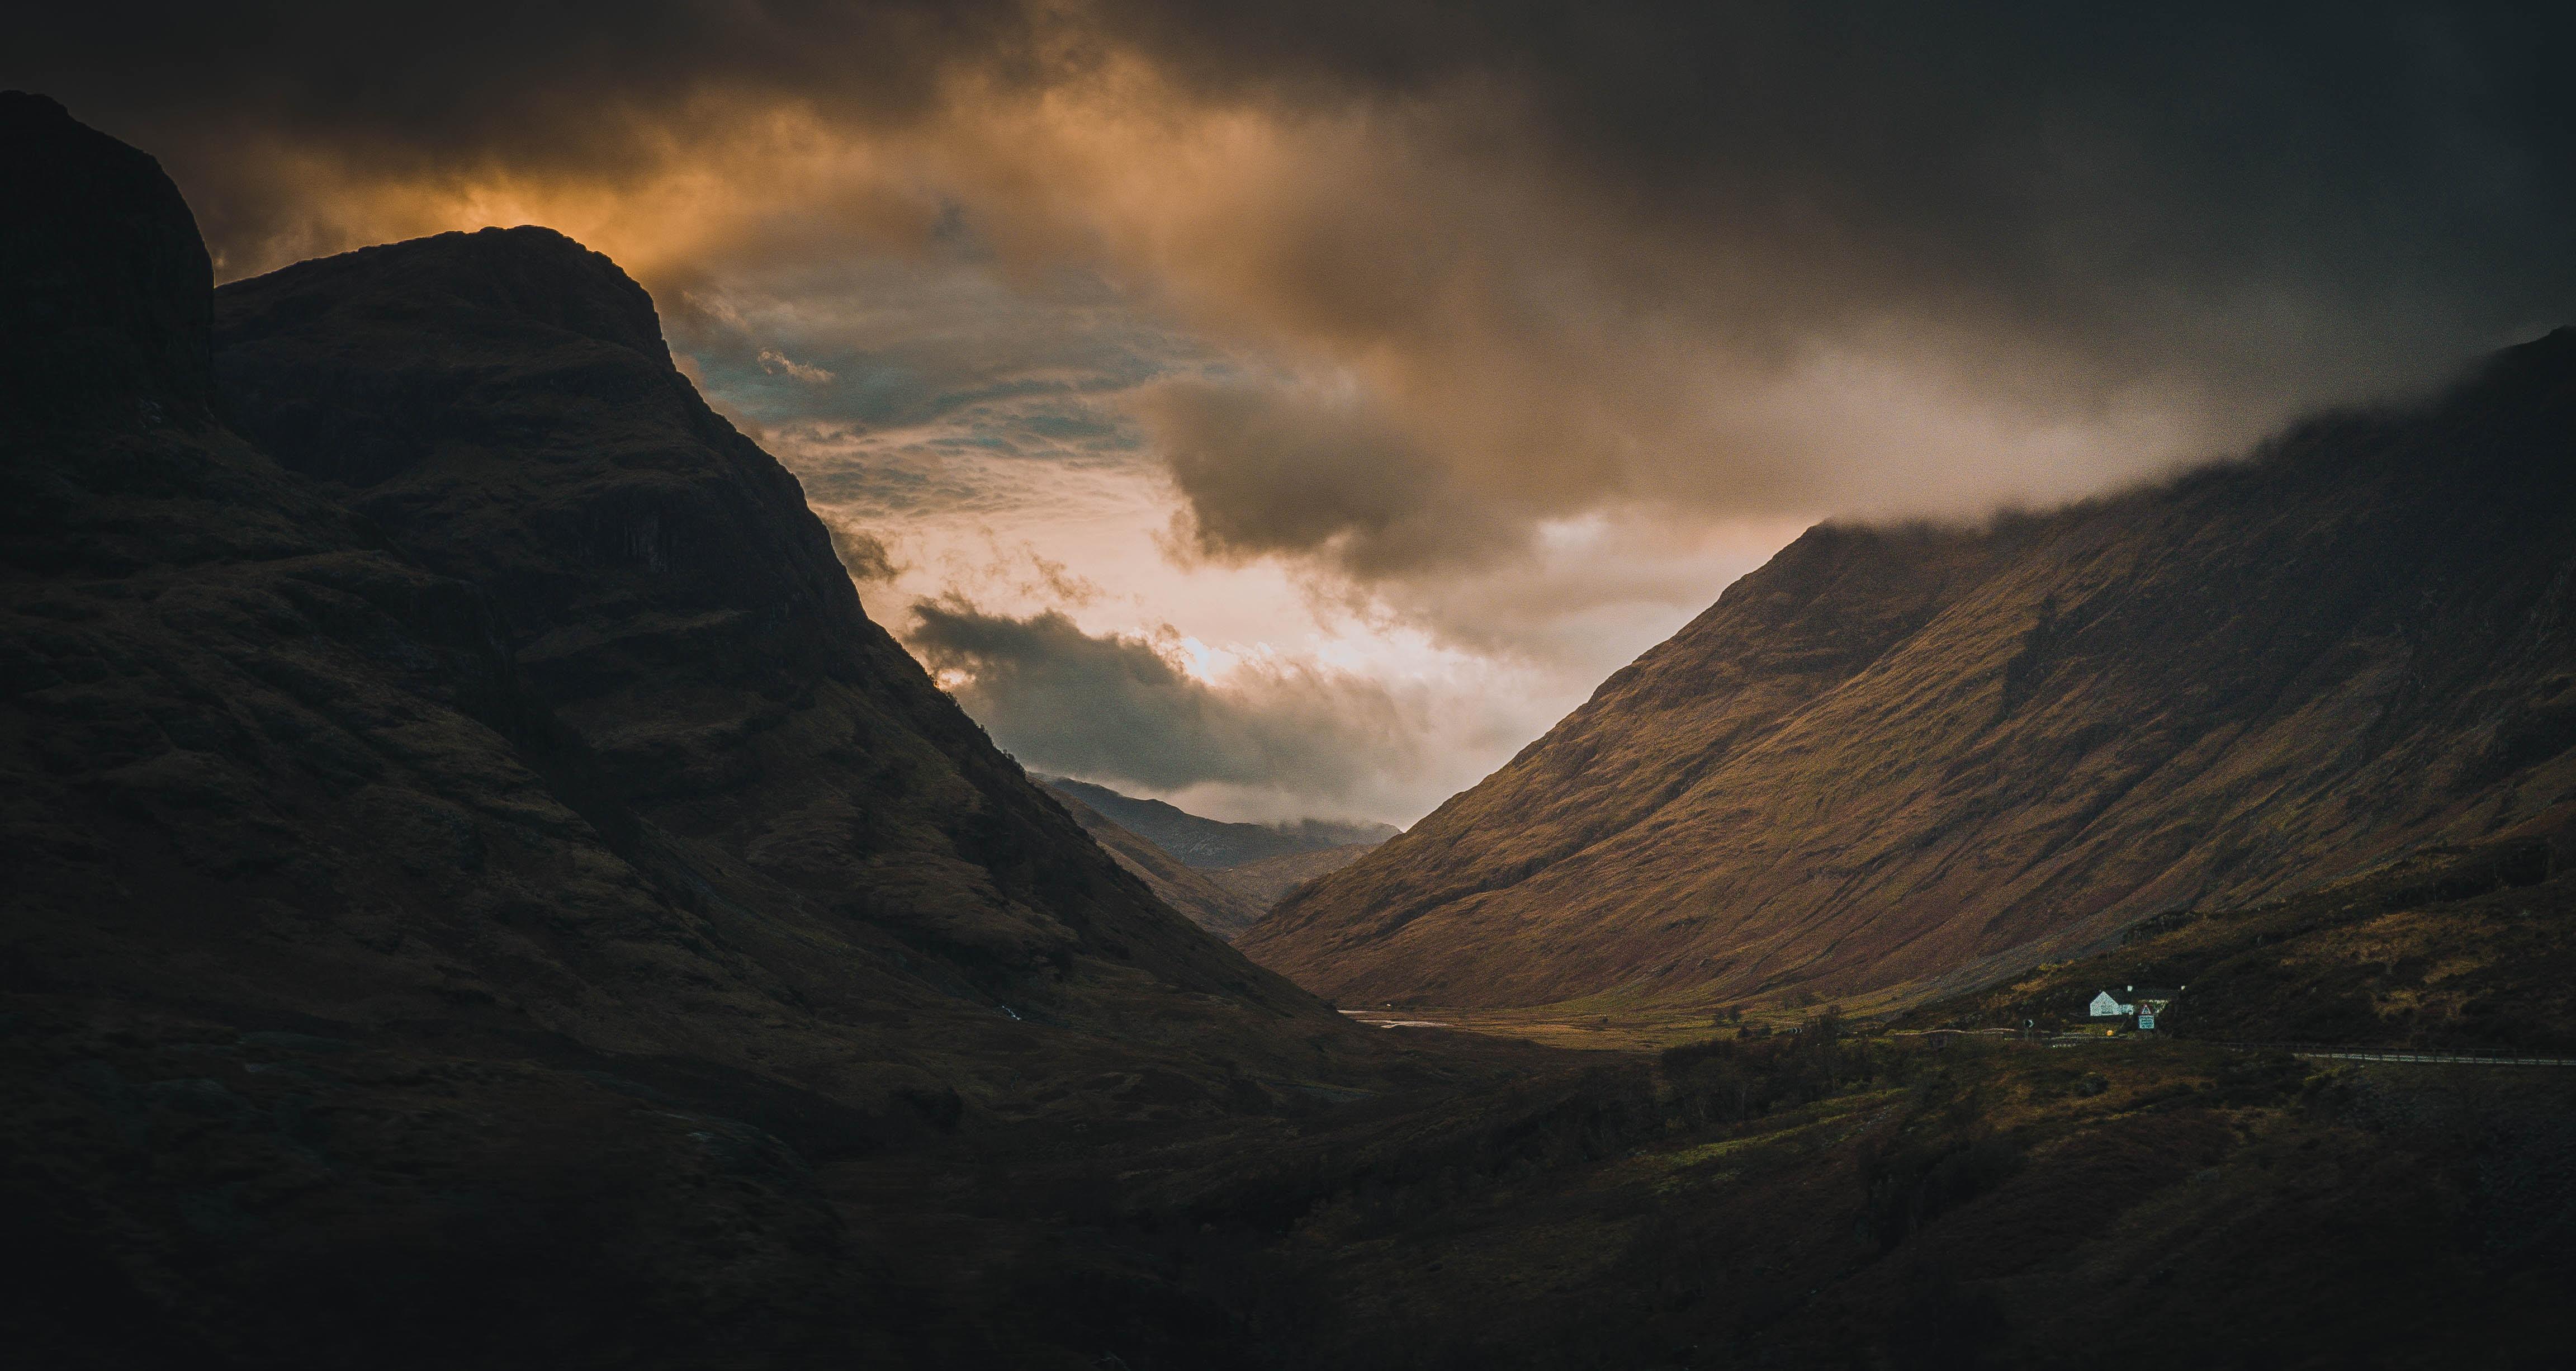 landscape shot of mountain